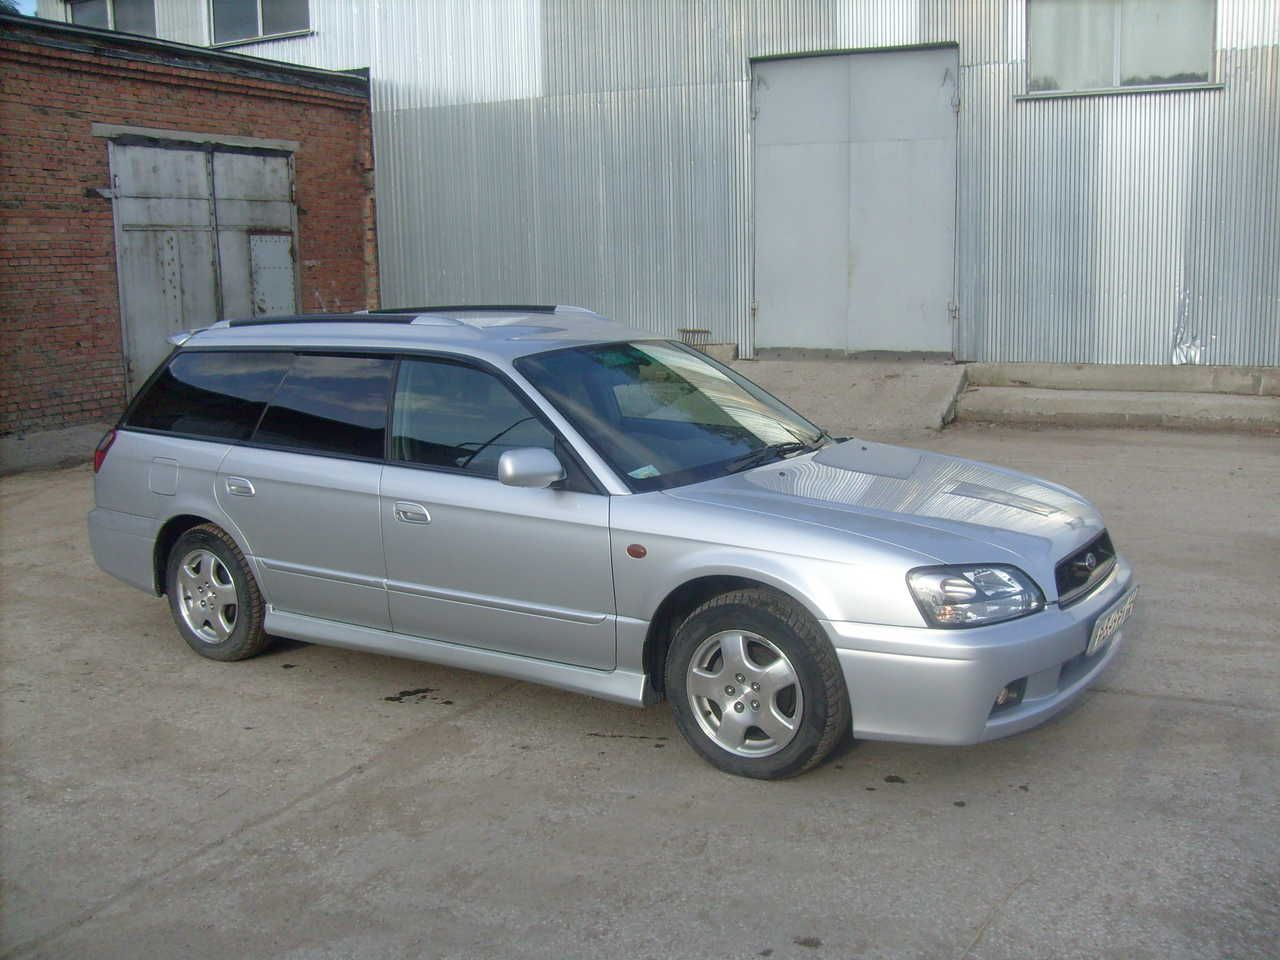 Used 2002 Subaru Legacy Wagon Photos 2000cc Gasoline Automatic For Sale Subaru Legacy Wagon Subaru Legacy Subaru